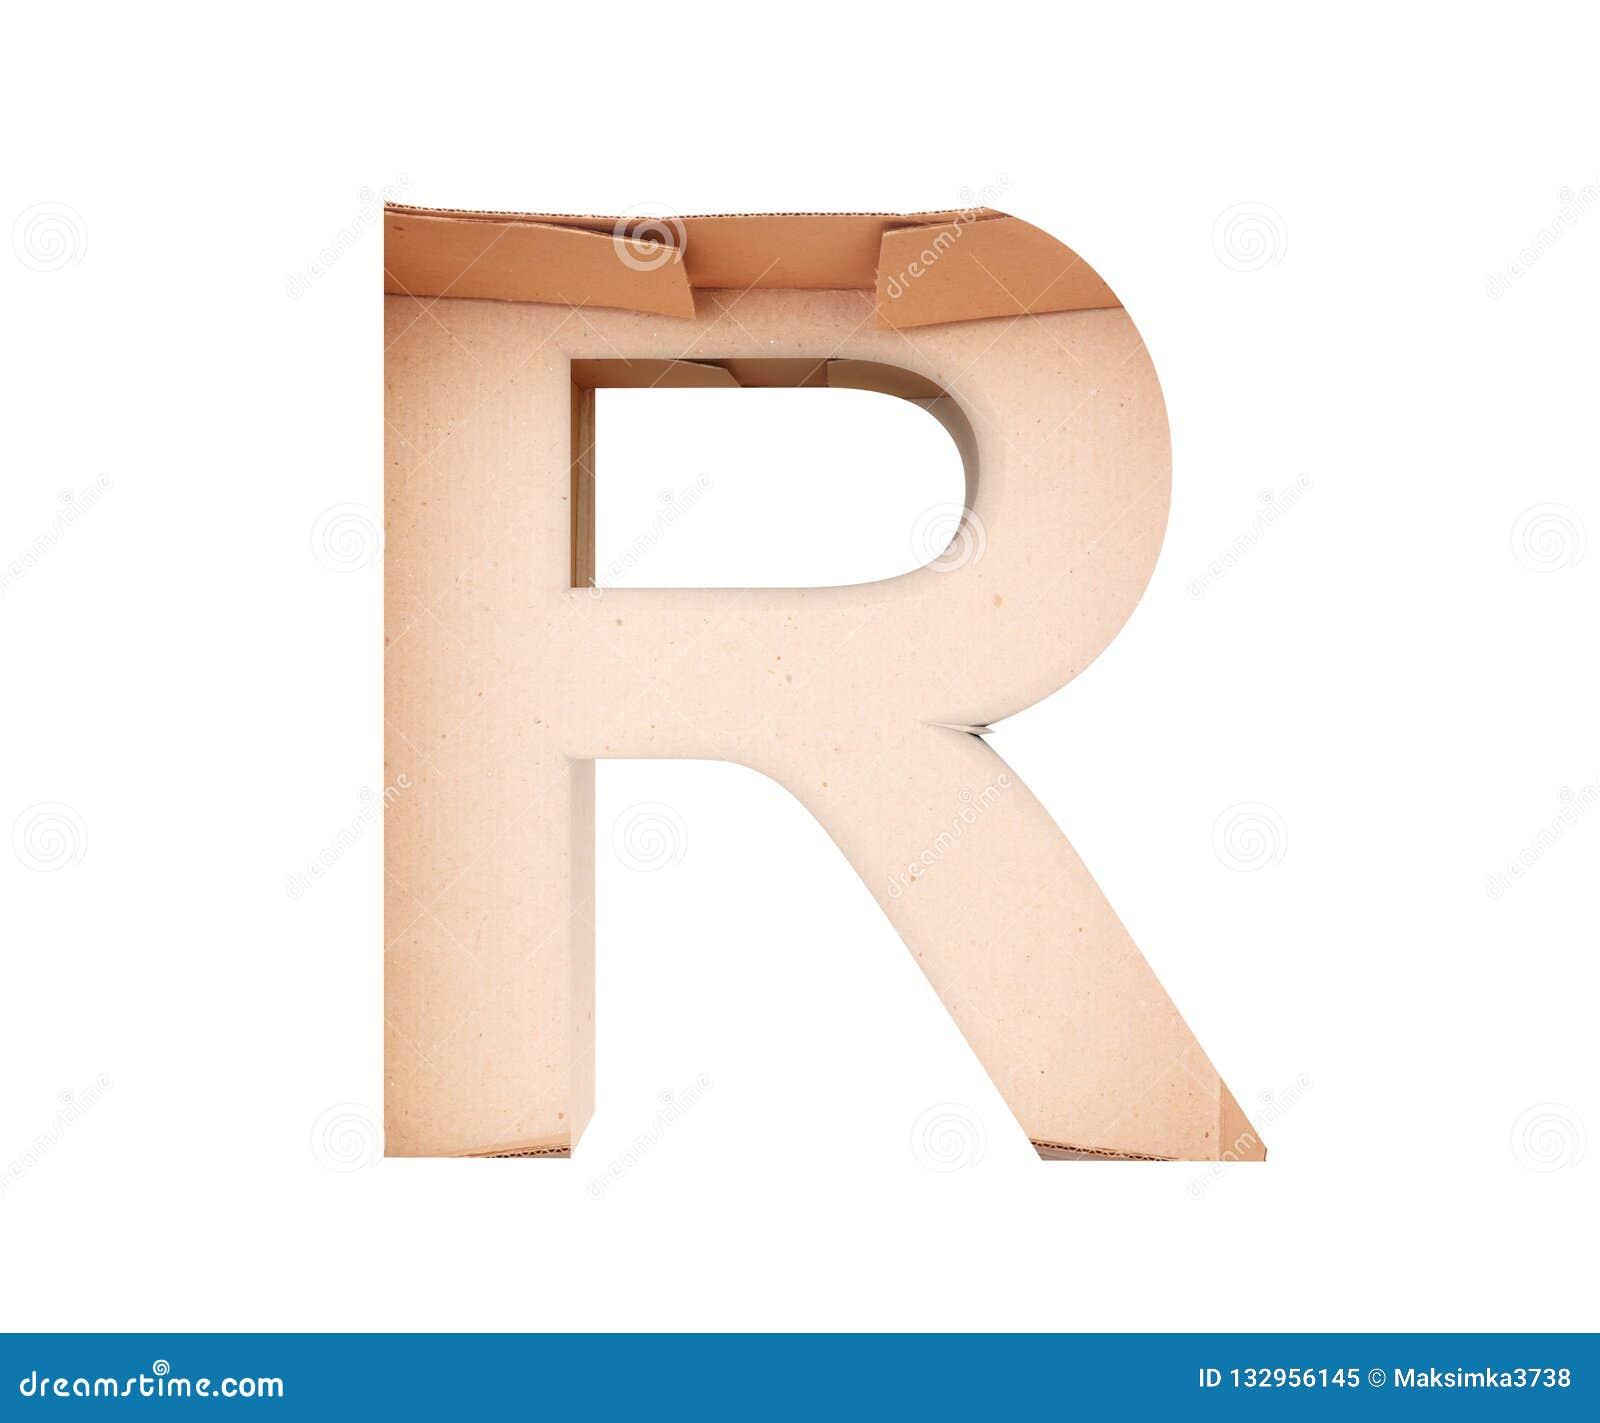 3D decorative Alphabet From cardboard box, capital letter R.